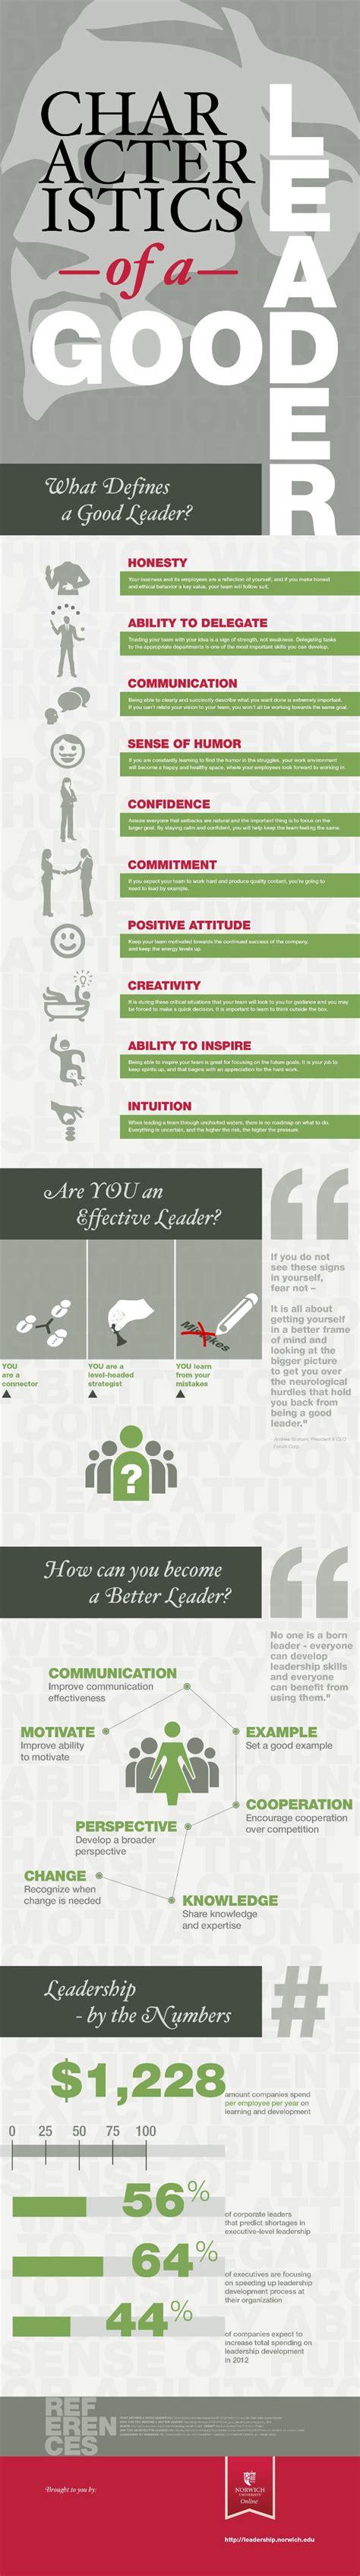 Mba School Characteristics by Top 10 Characteristics Of Leaders